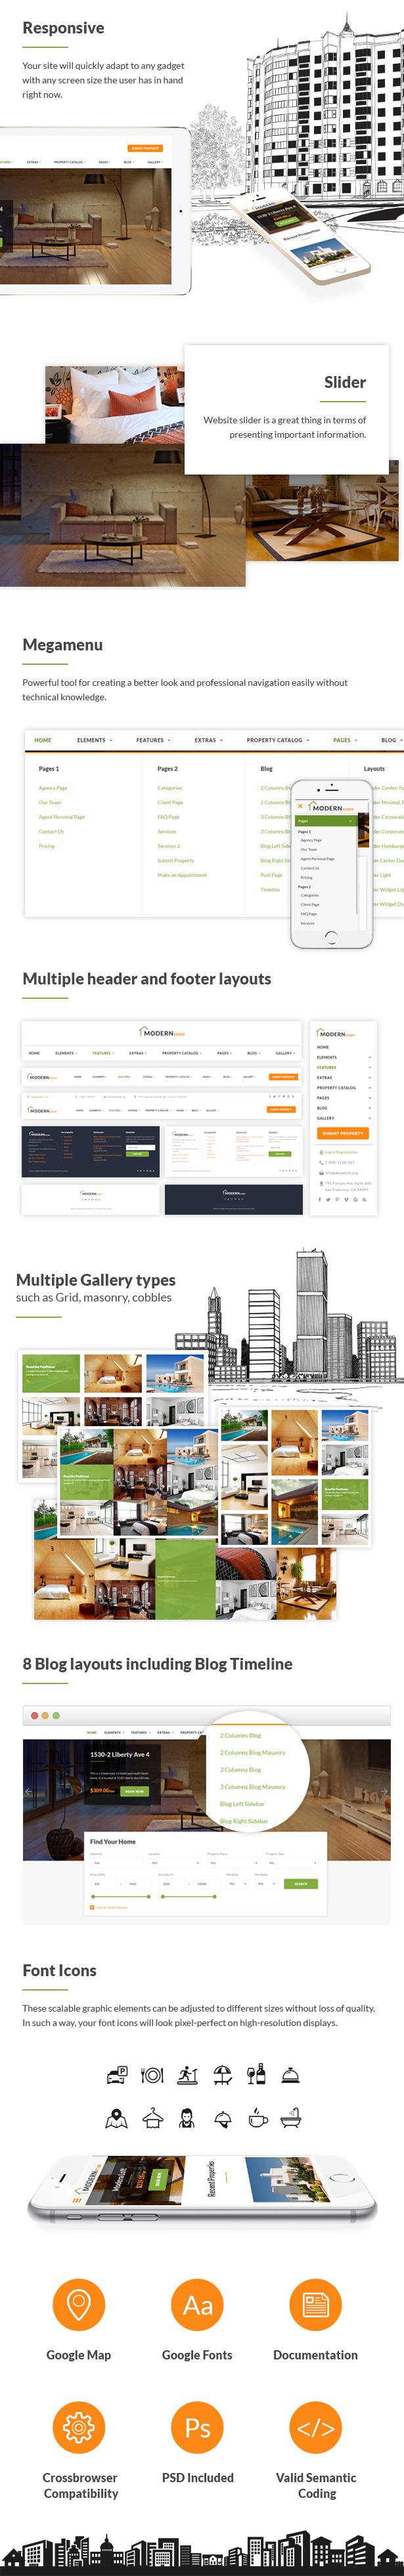 Modern Estate - Premium Website Template - 1